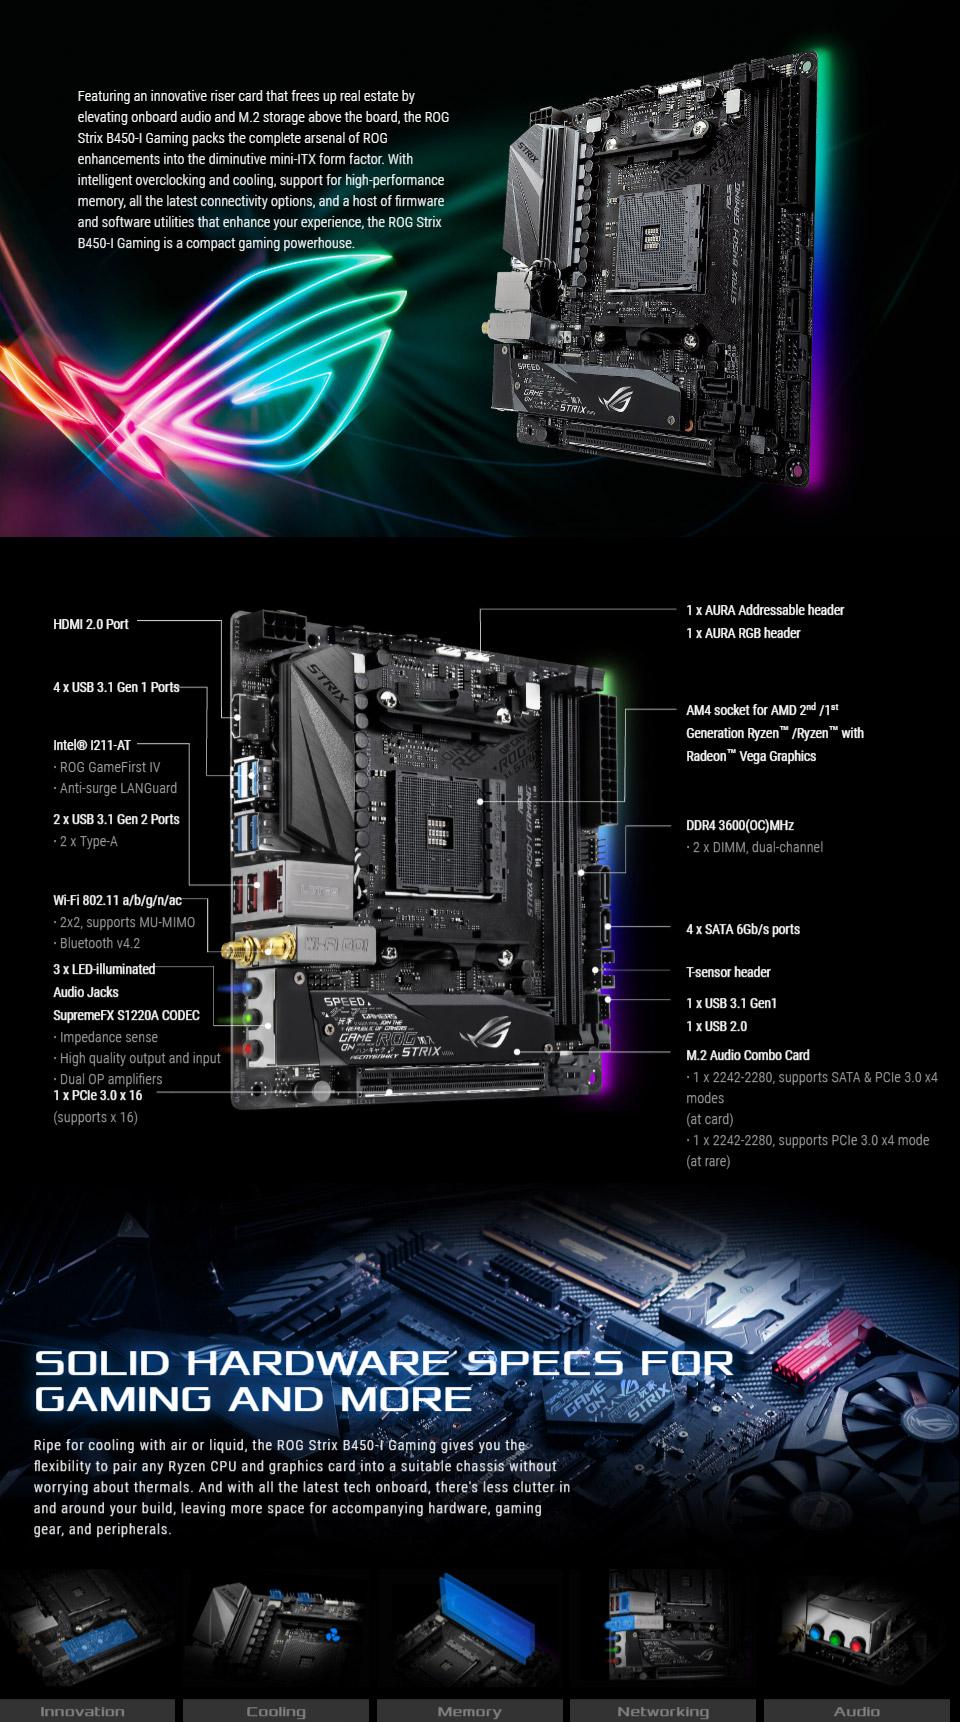 Asus Rog Strix B450 I Gaming Motherboard I8 Keyboard Mini Wearless Pnp Windows Wireless 80211ac Blueooth 42 Hdmi 20b Supremefx 8 Channel High Definition Audio Codec S1220a 5 Way Optimization Aura Sync Rgb Itx